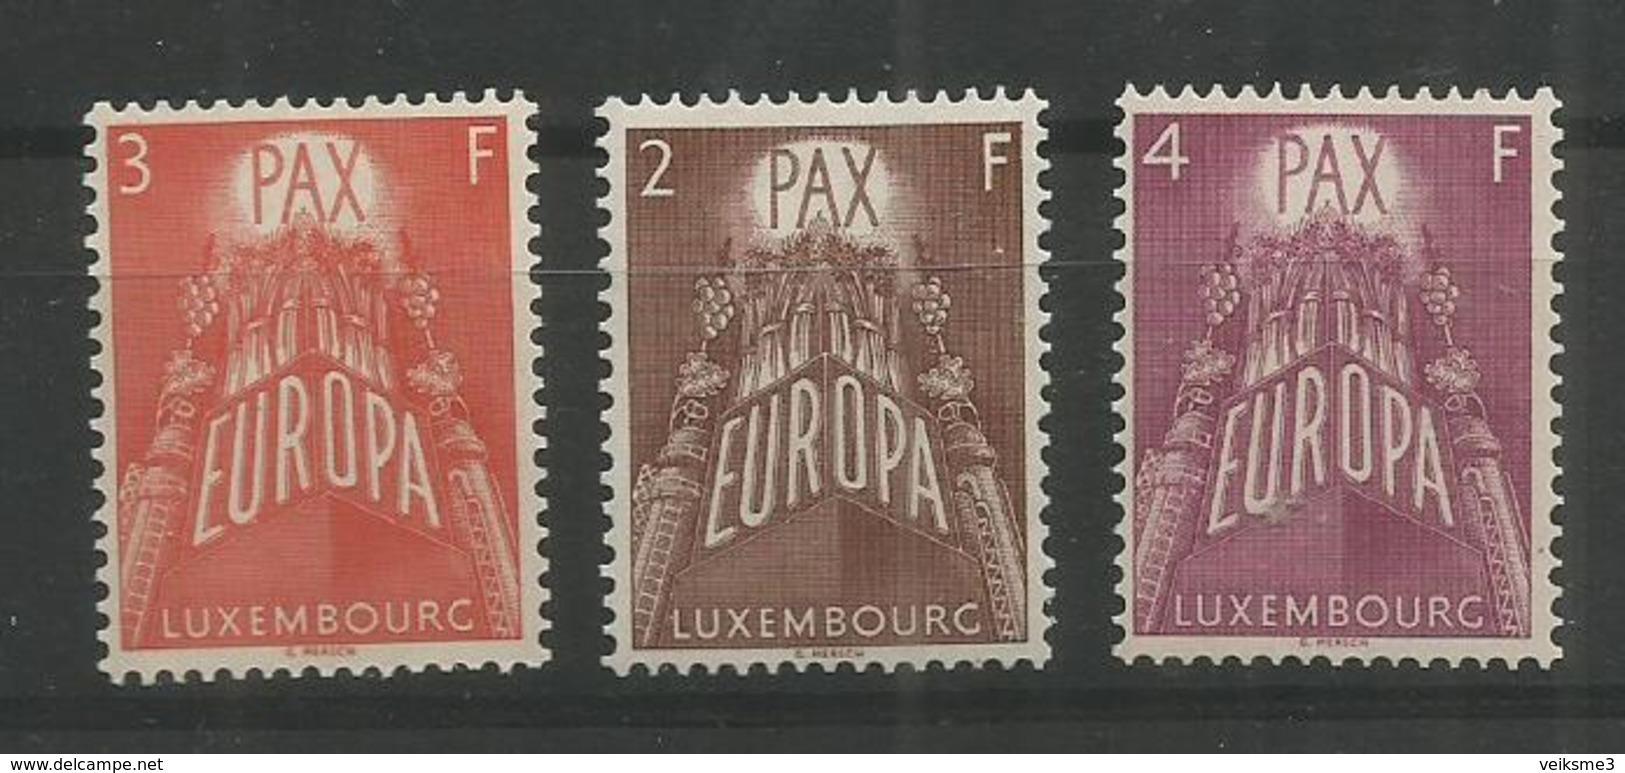 LUXEMBOURG - MNH - Europa-CEPT - Architecture - 1957 - Europa-CEPT